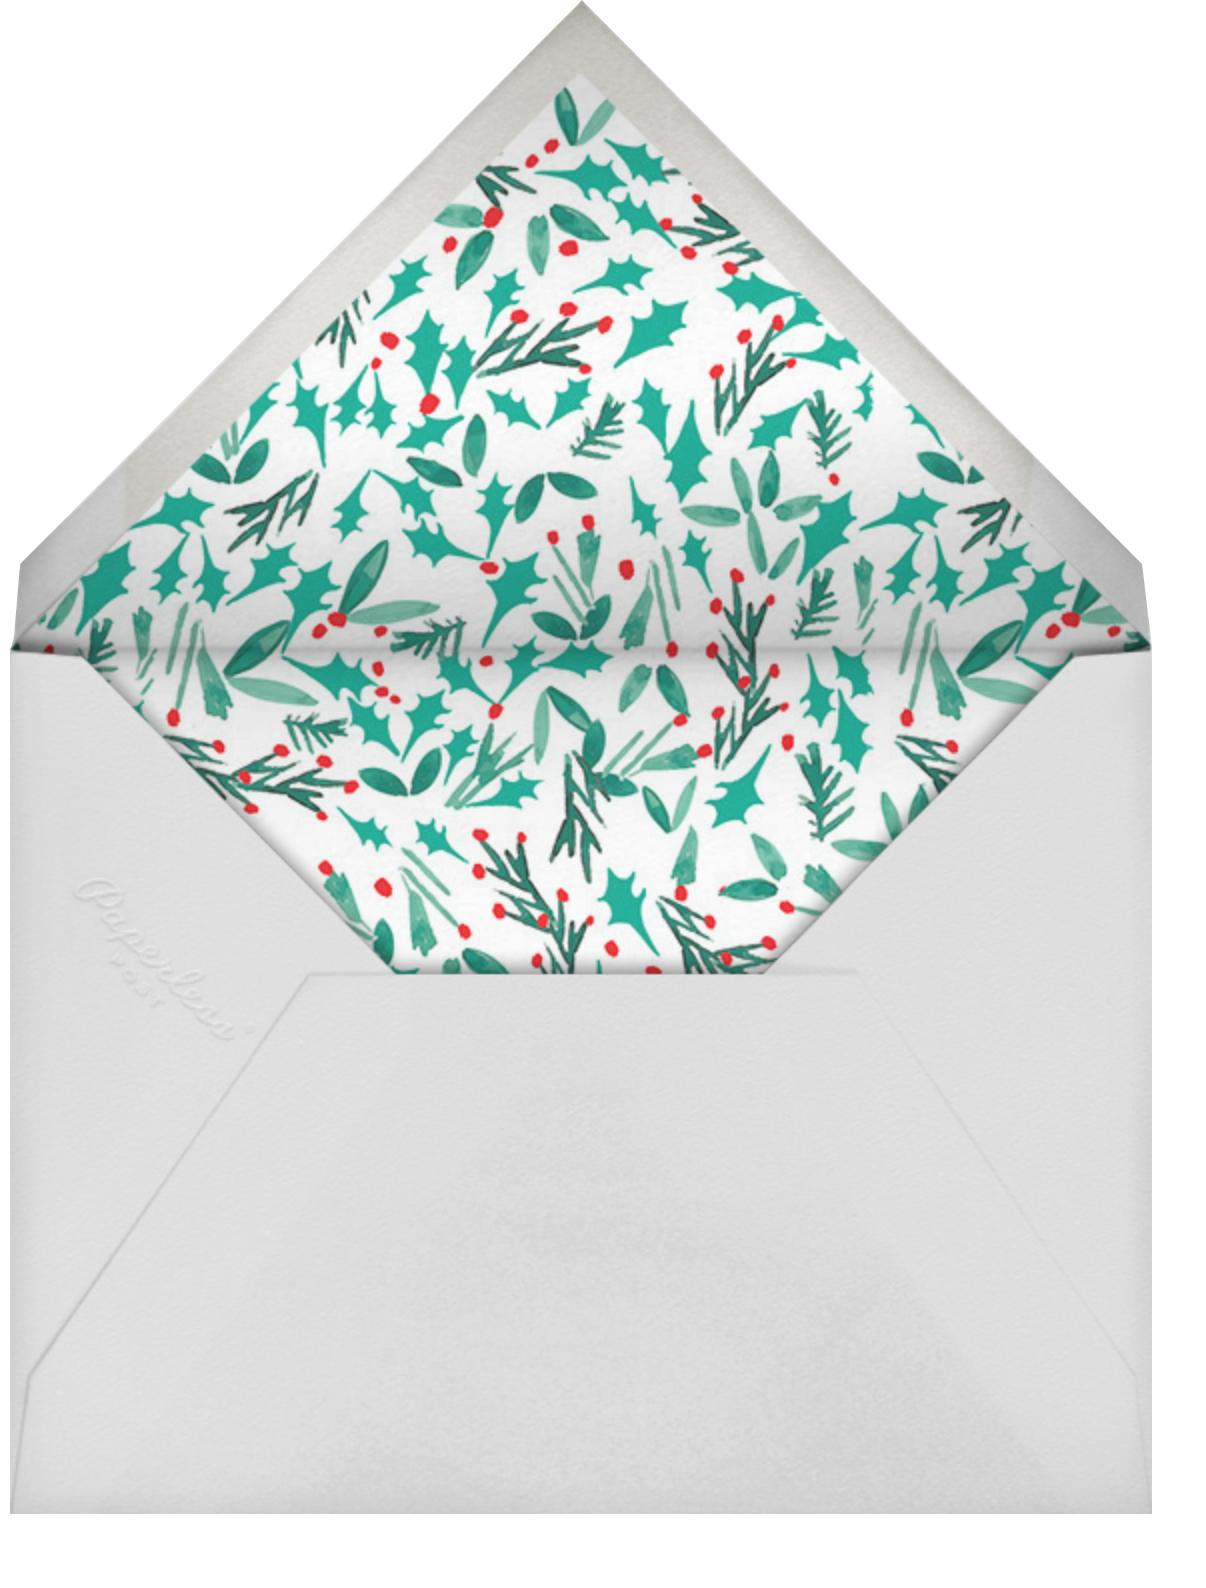 Watch for Reindeer Crossings - Mr. Boddington's Studio - Envelope